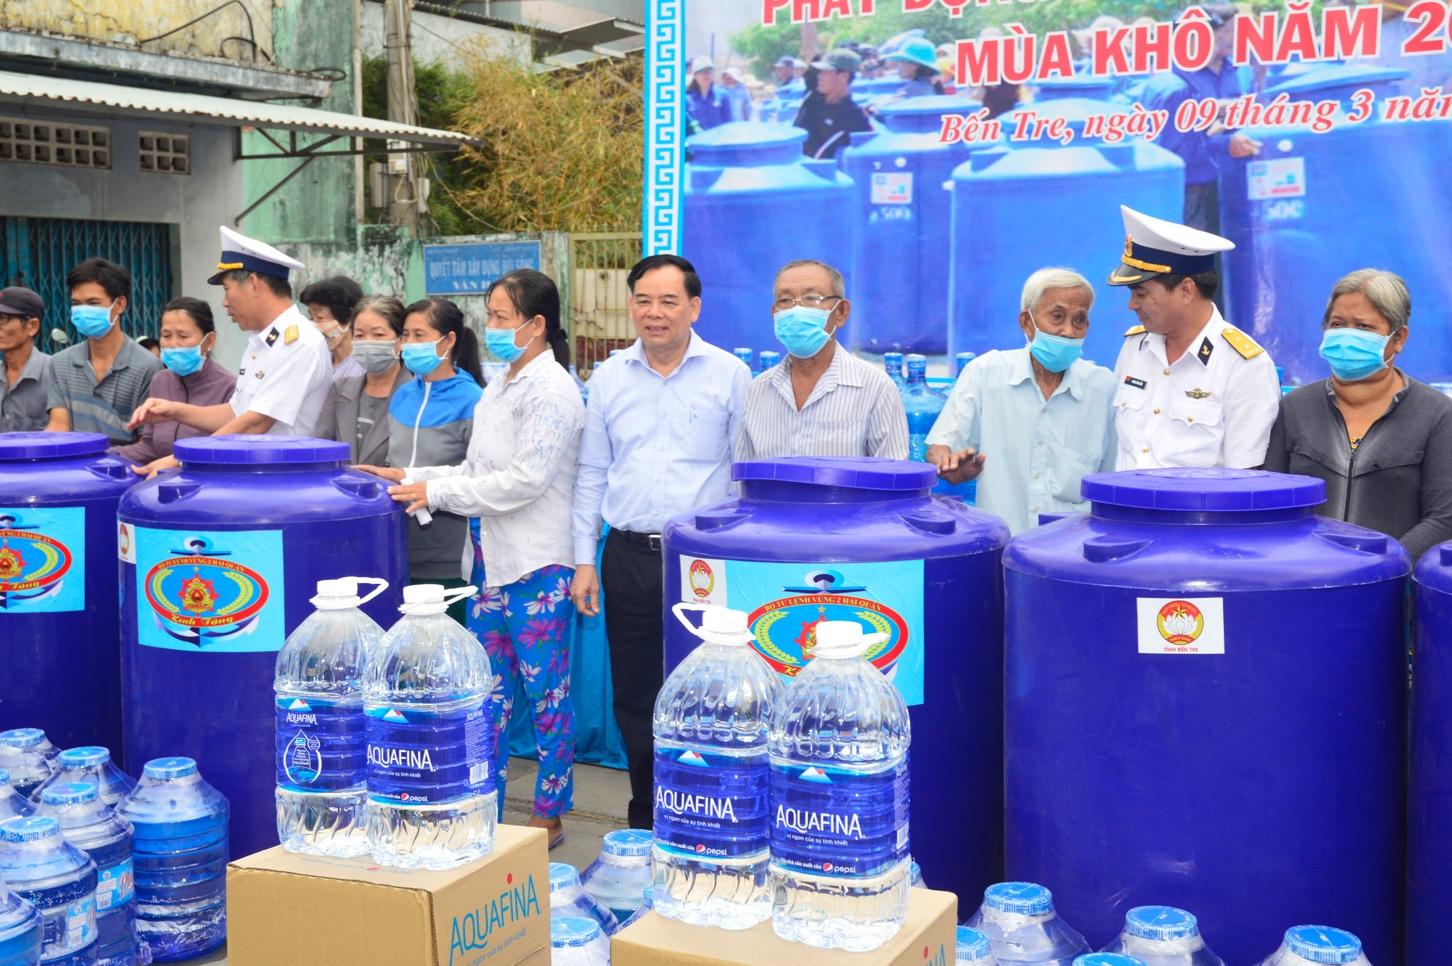 Suntory PepsiCo Vietnam donates 40,000 liters of bottled water to drought-struck Mekong Delta province